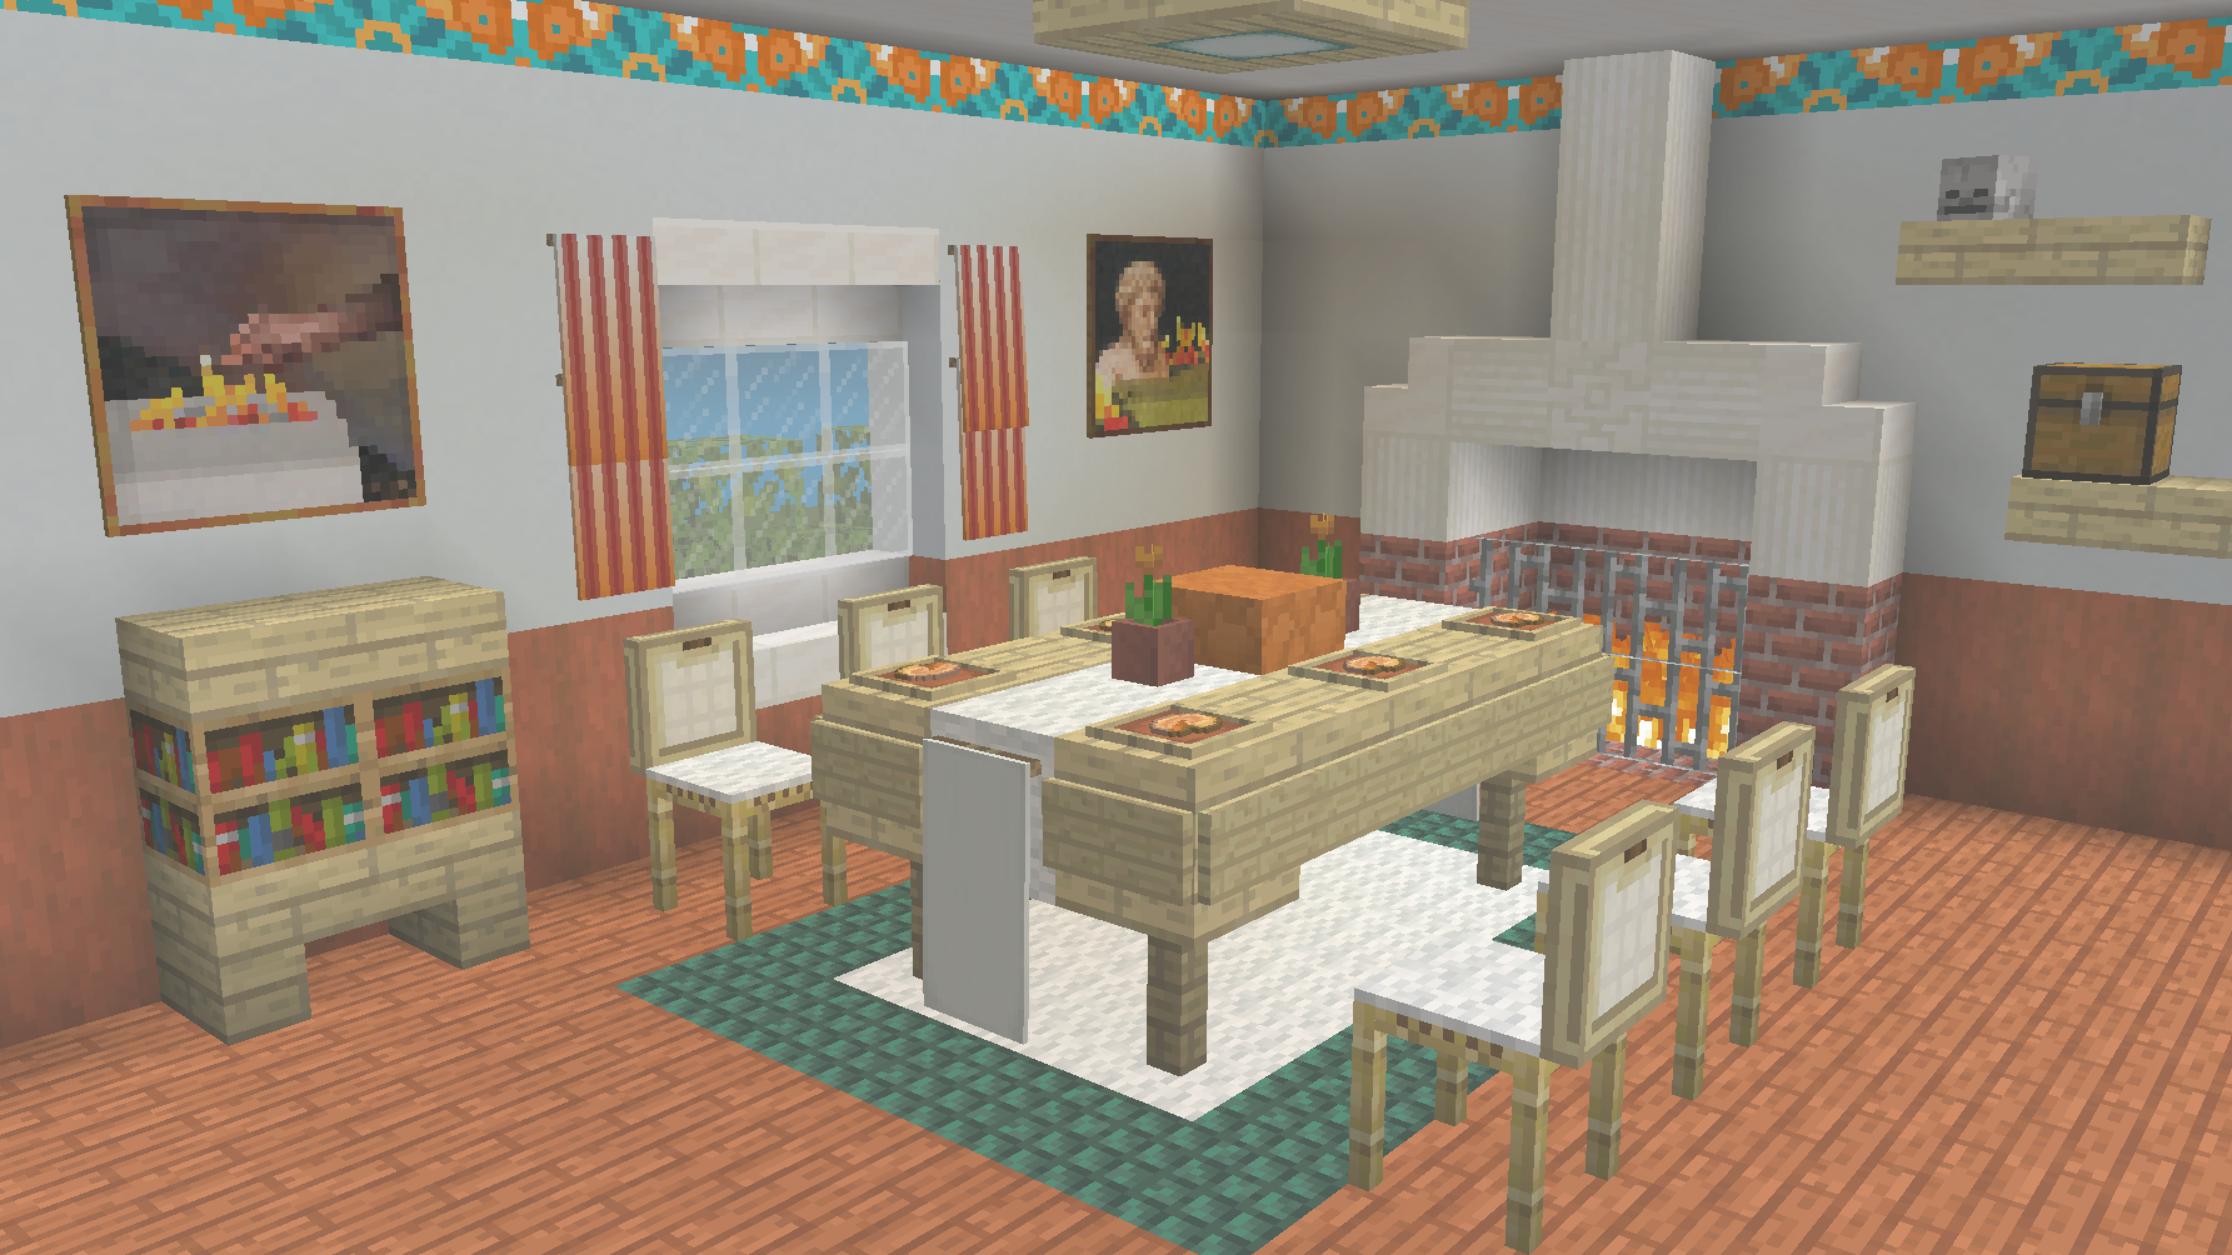 A Nice Little Dinner Room Minecraft Minecraftbuildingideas A Nice Little Dinner Room Minecraft Minecraft Decorations Minecraft Modern Minecraft Room